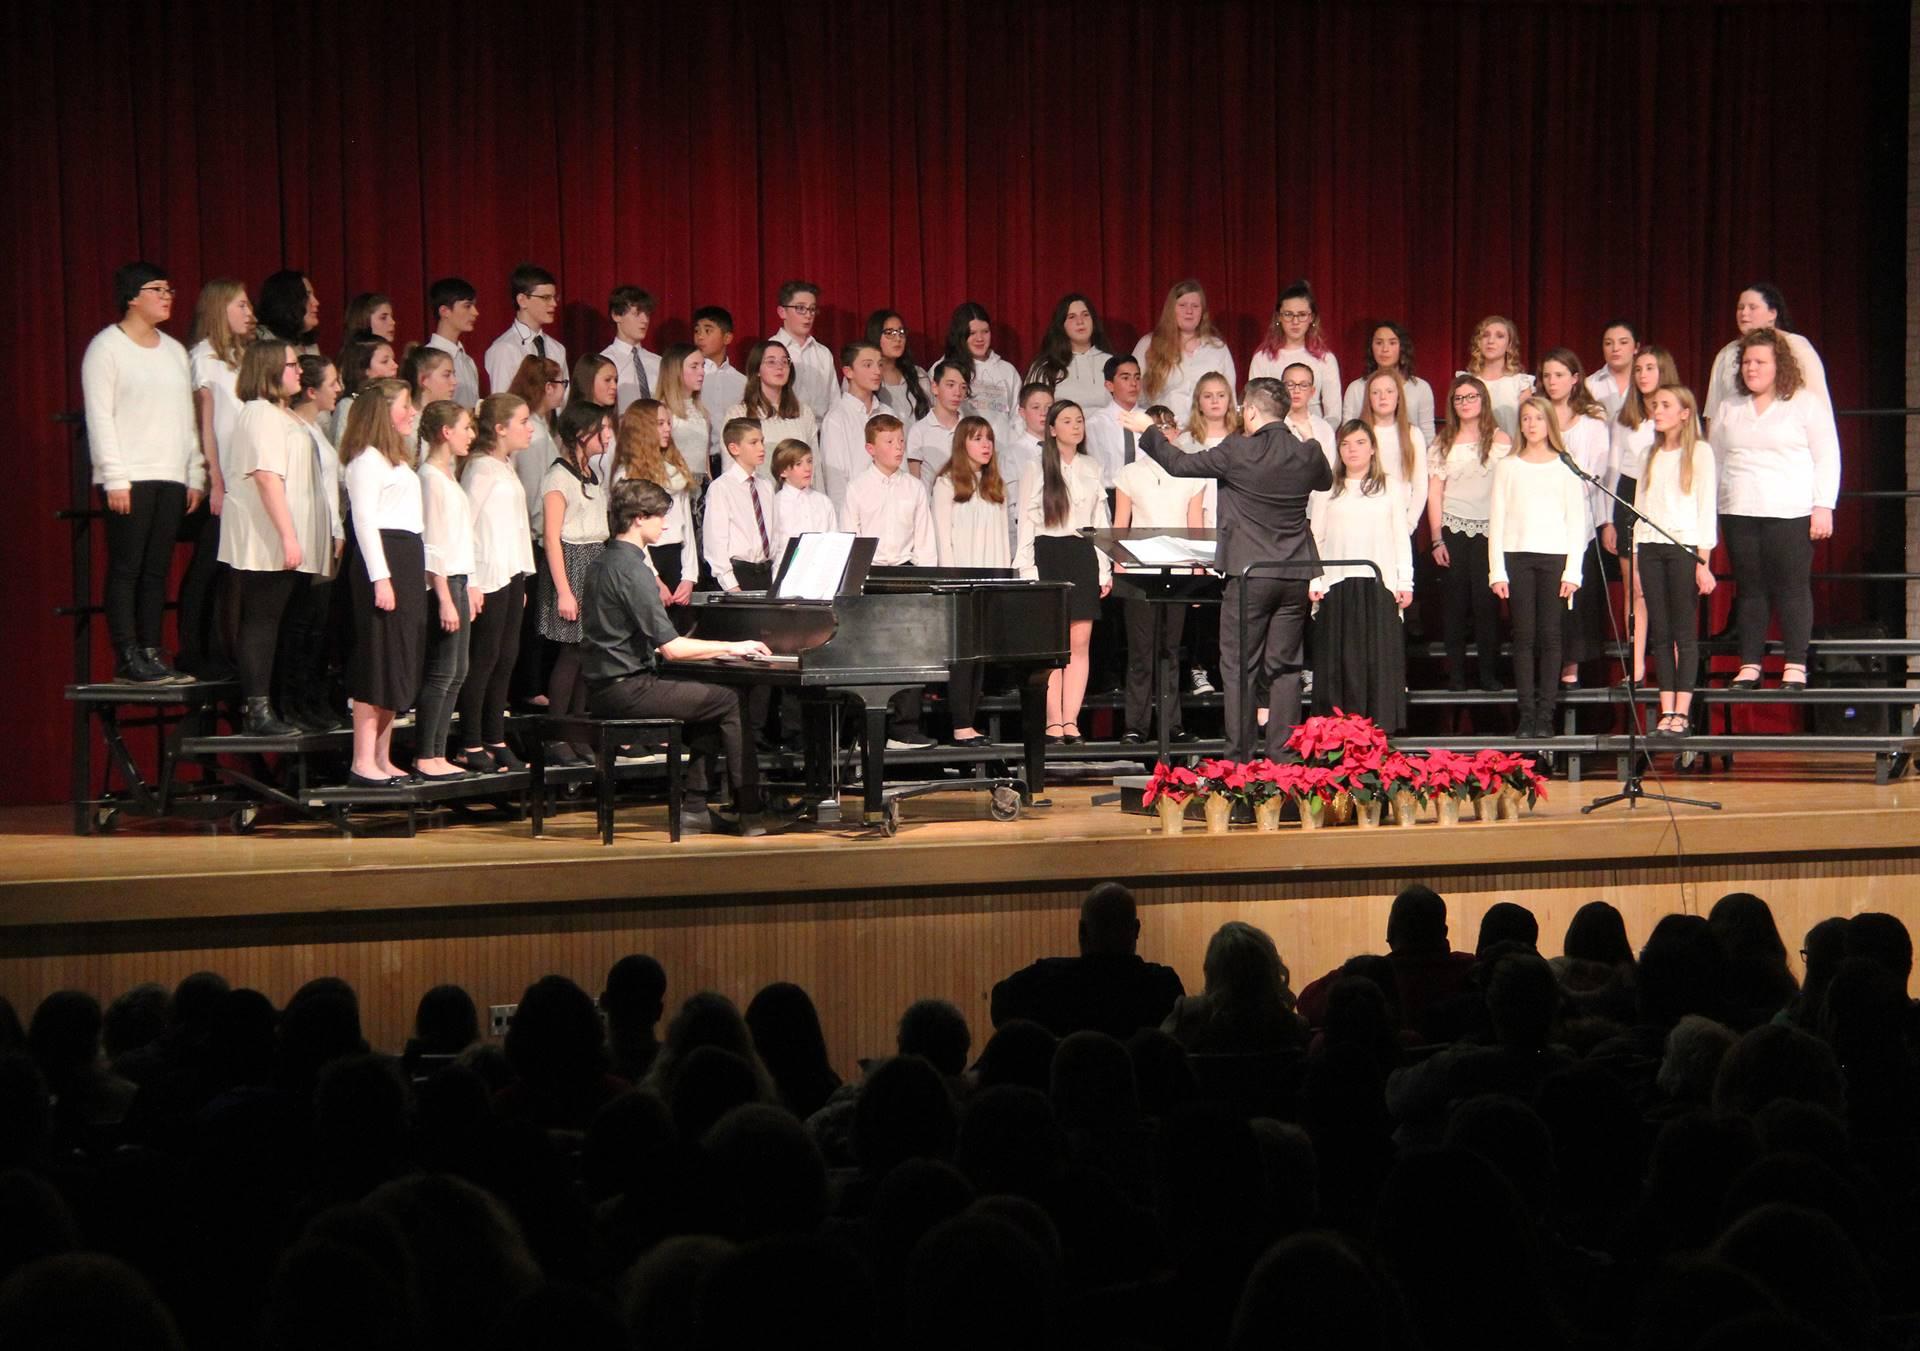 seventh and eighth grade chorus members singing